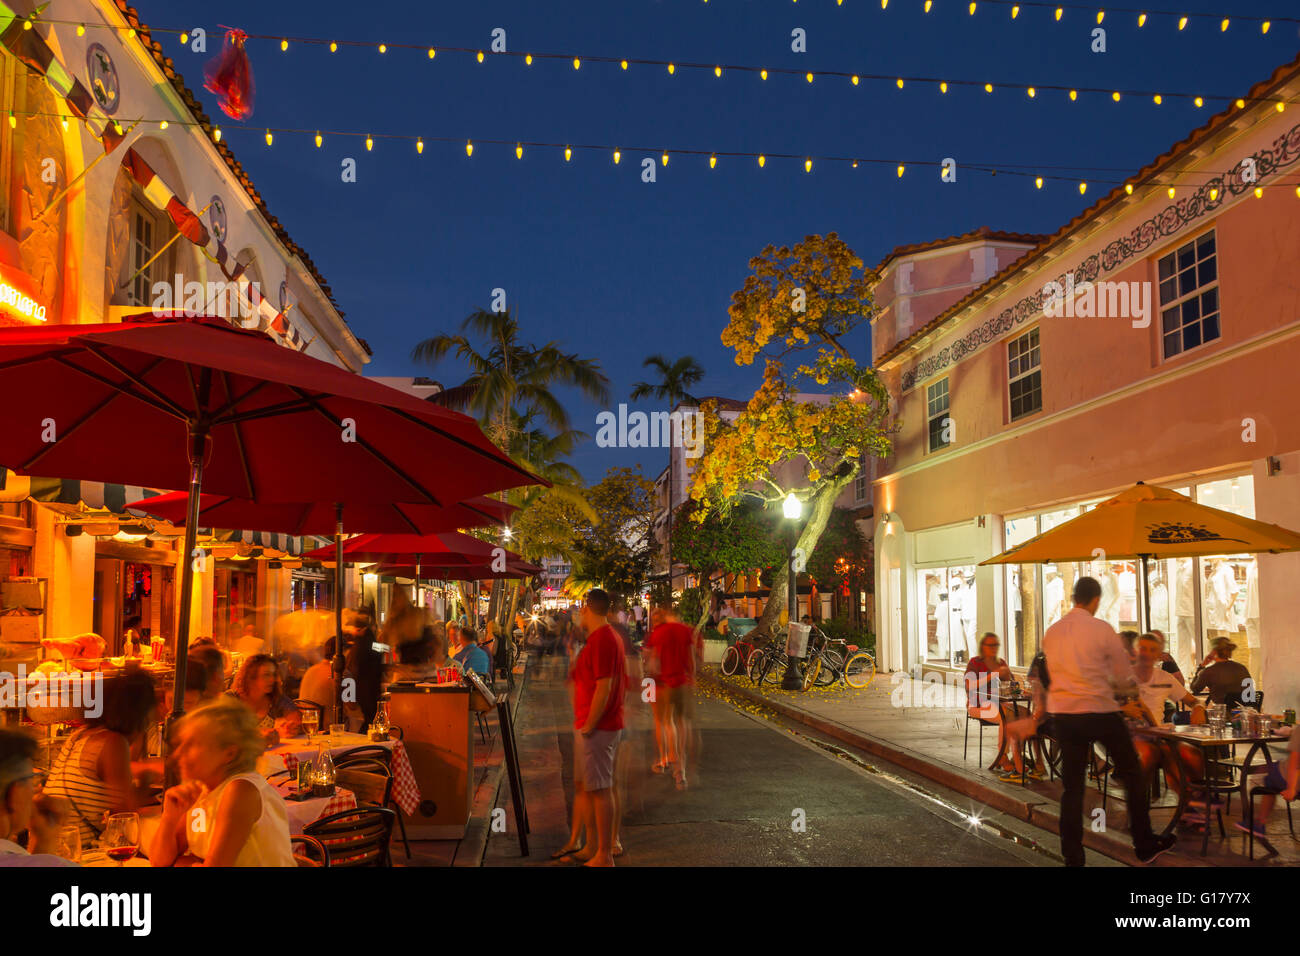 Restaurants Espanola Way Historic Spanish Village Miami Beach